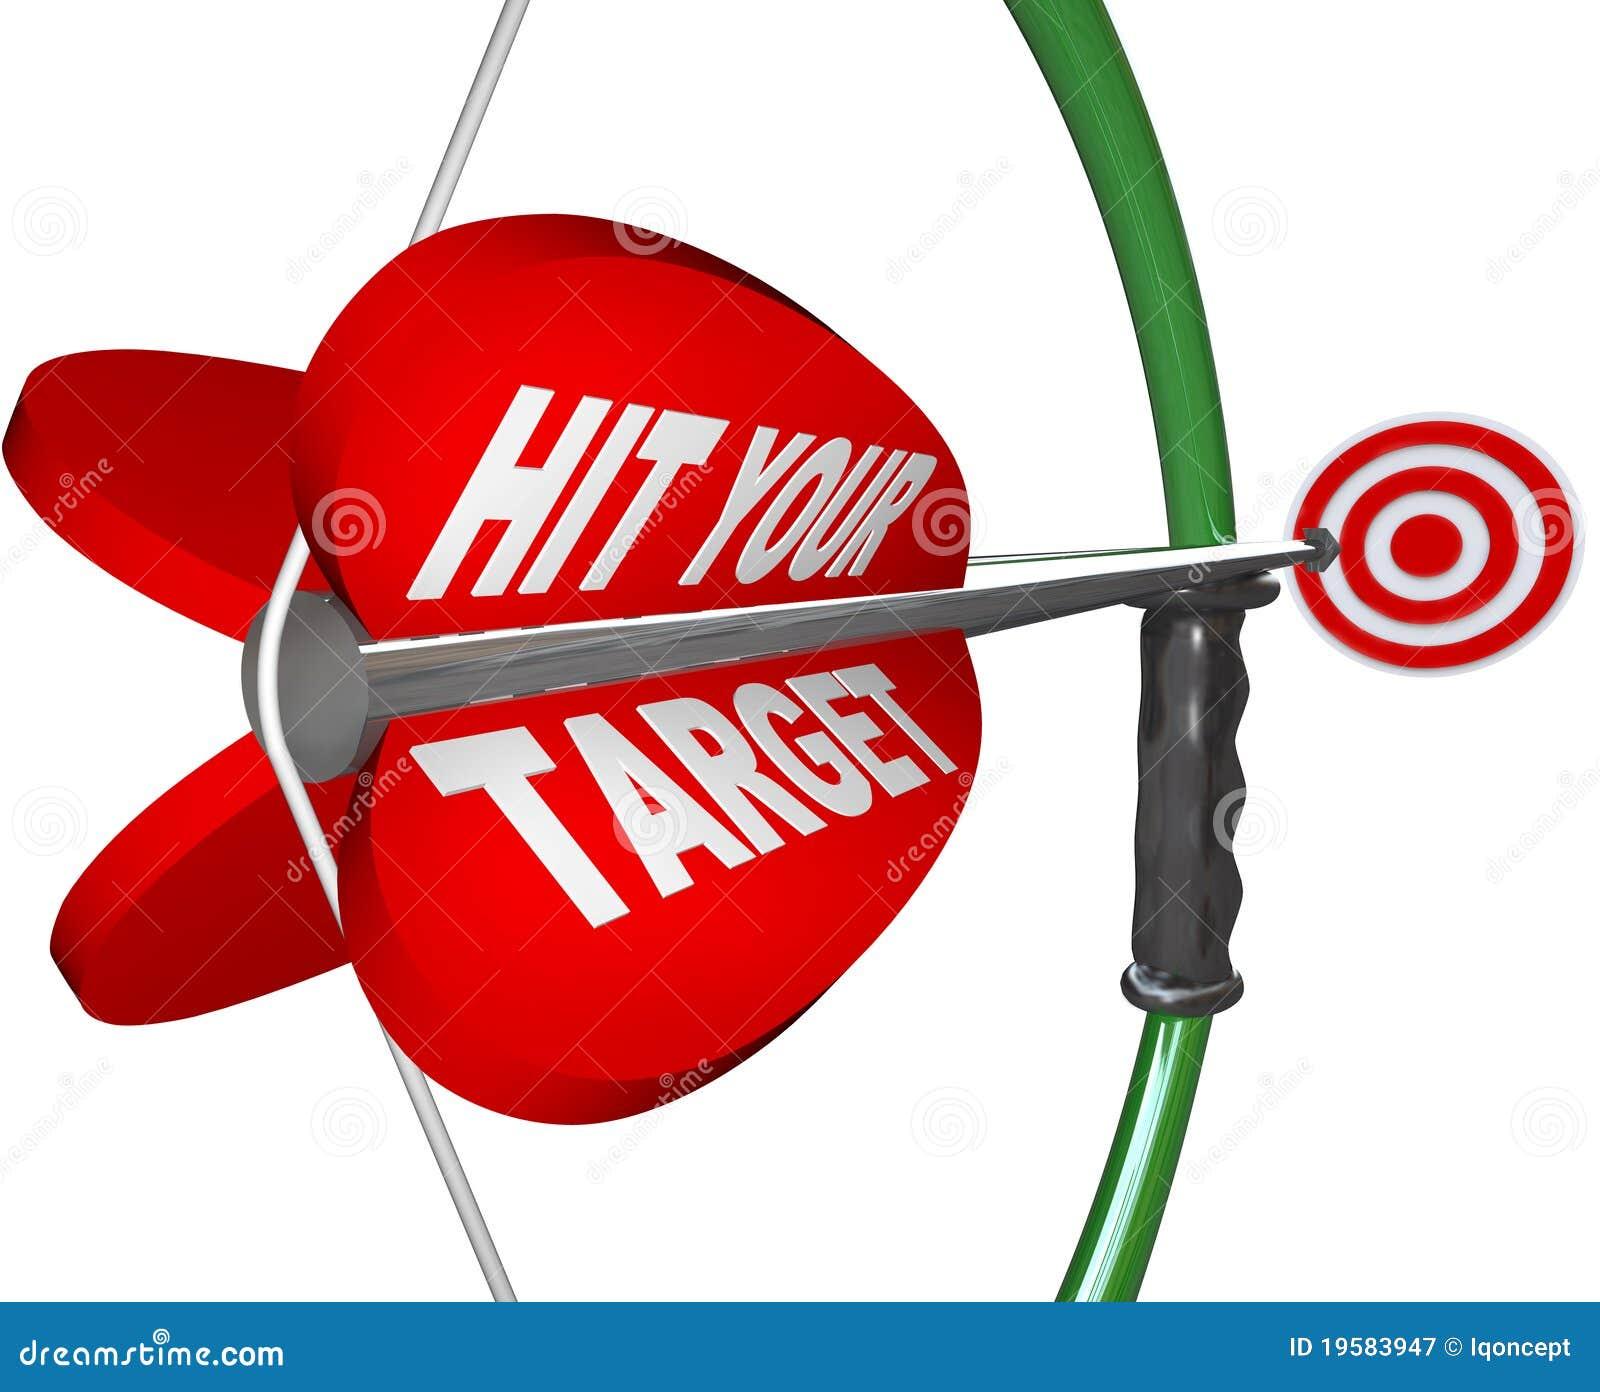 Hit Your Target - Bow and Arrow Aimed at Bulls Eye